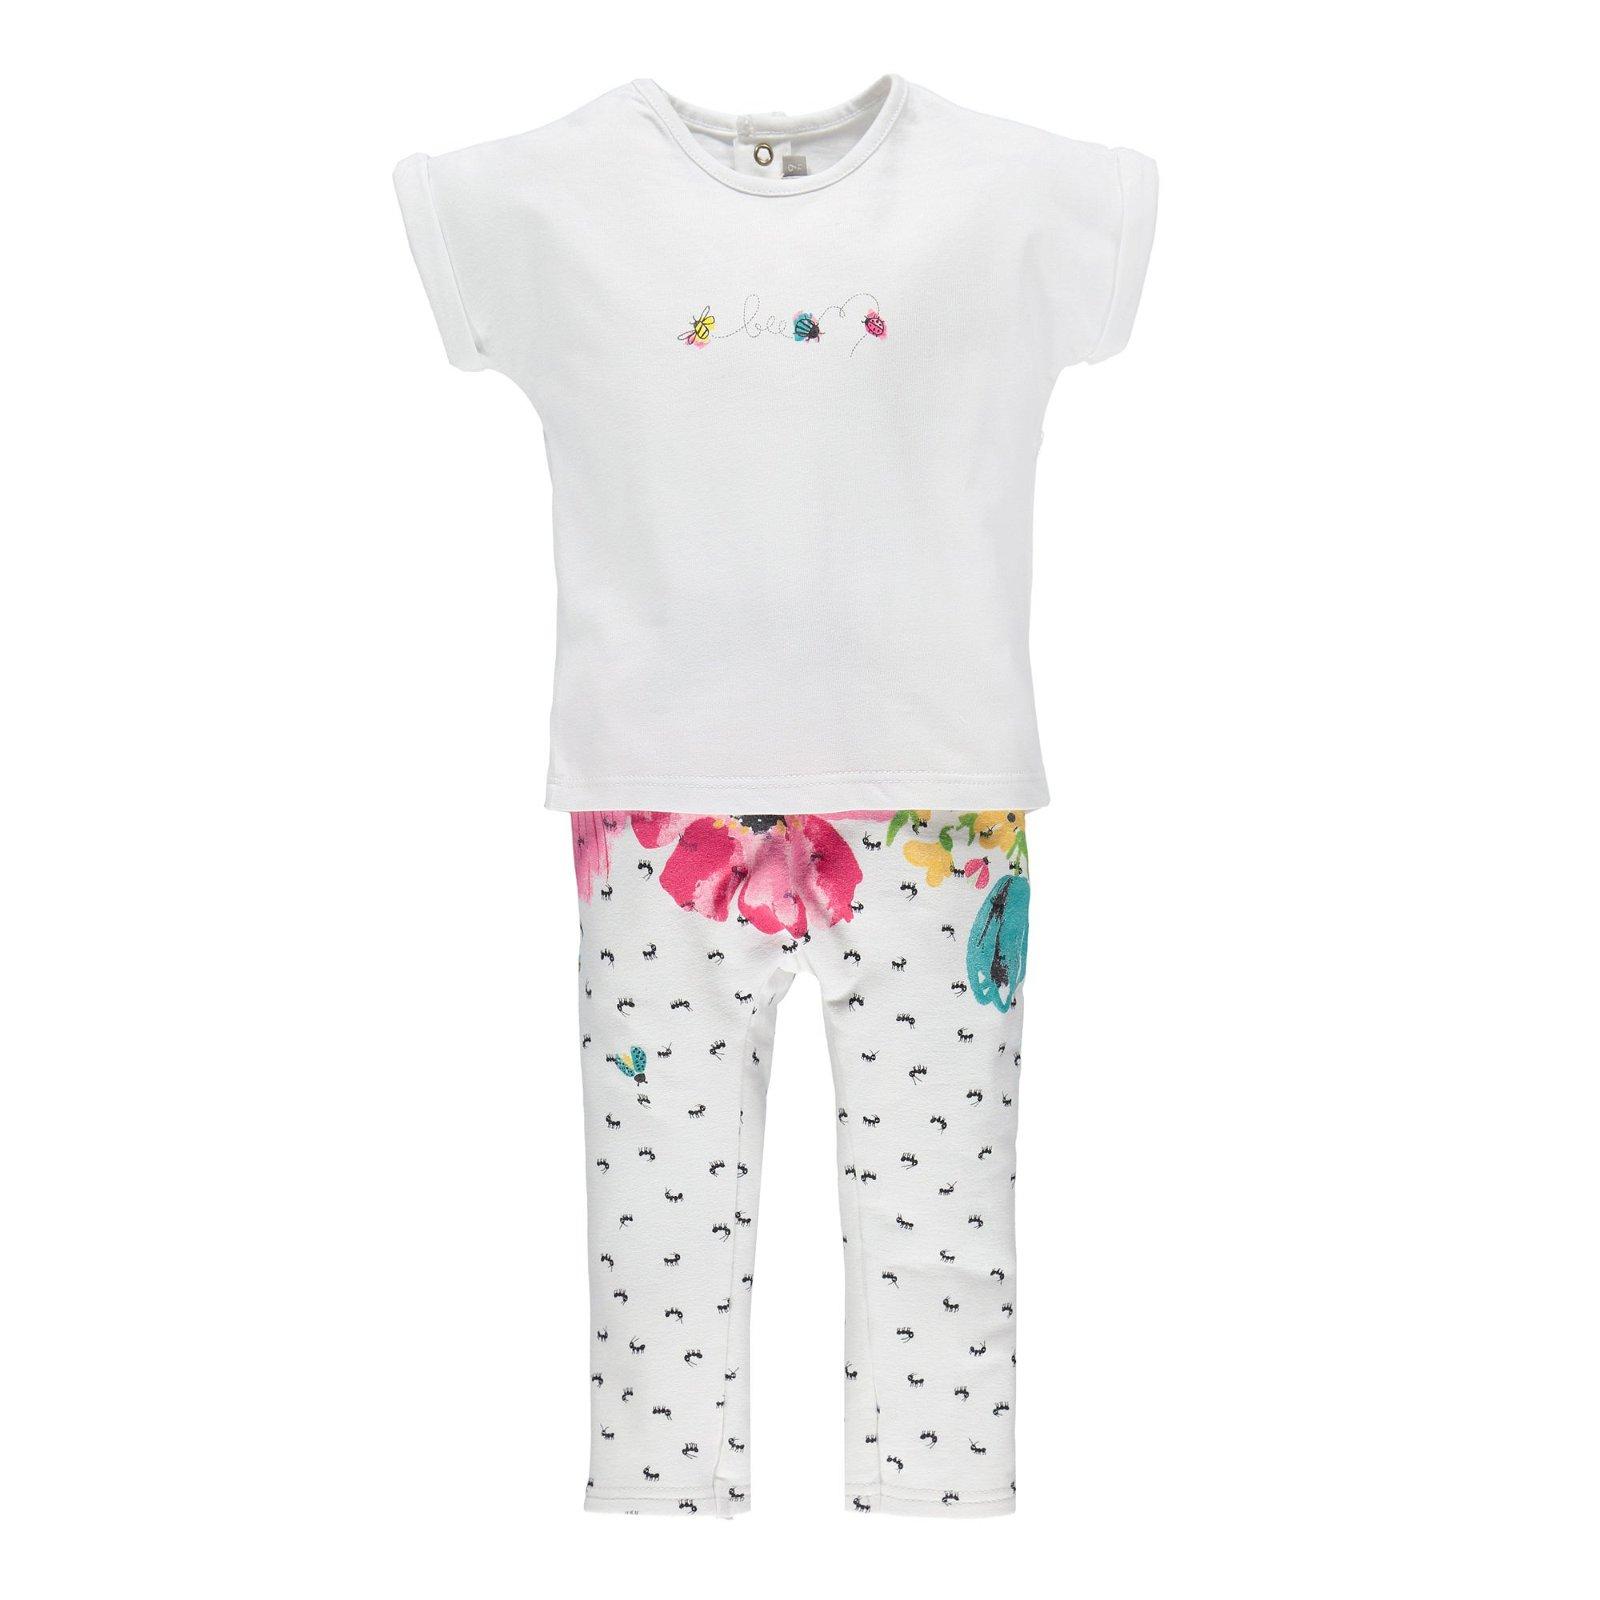 Completino neonata t-shirt + leggings